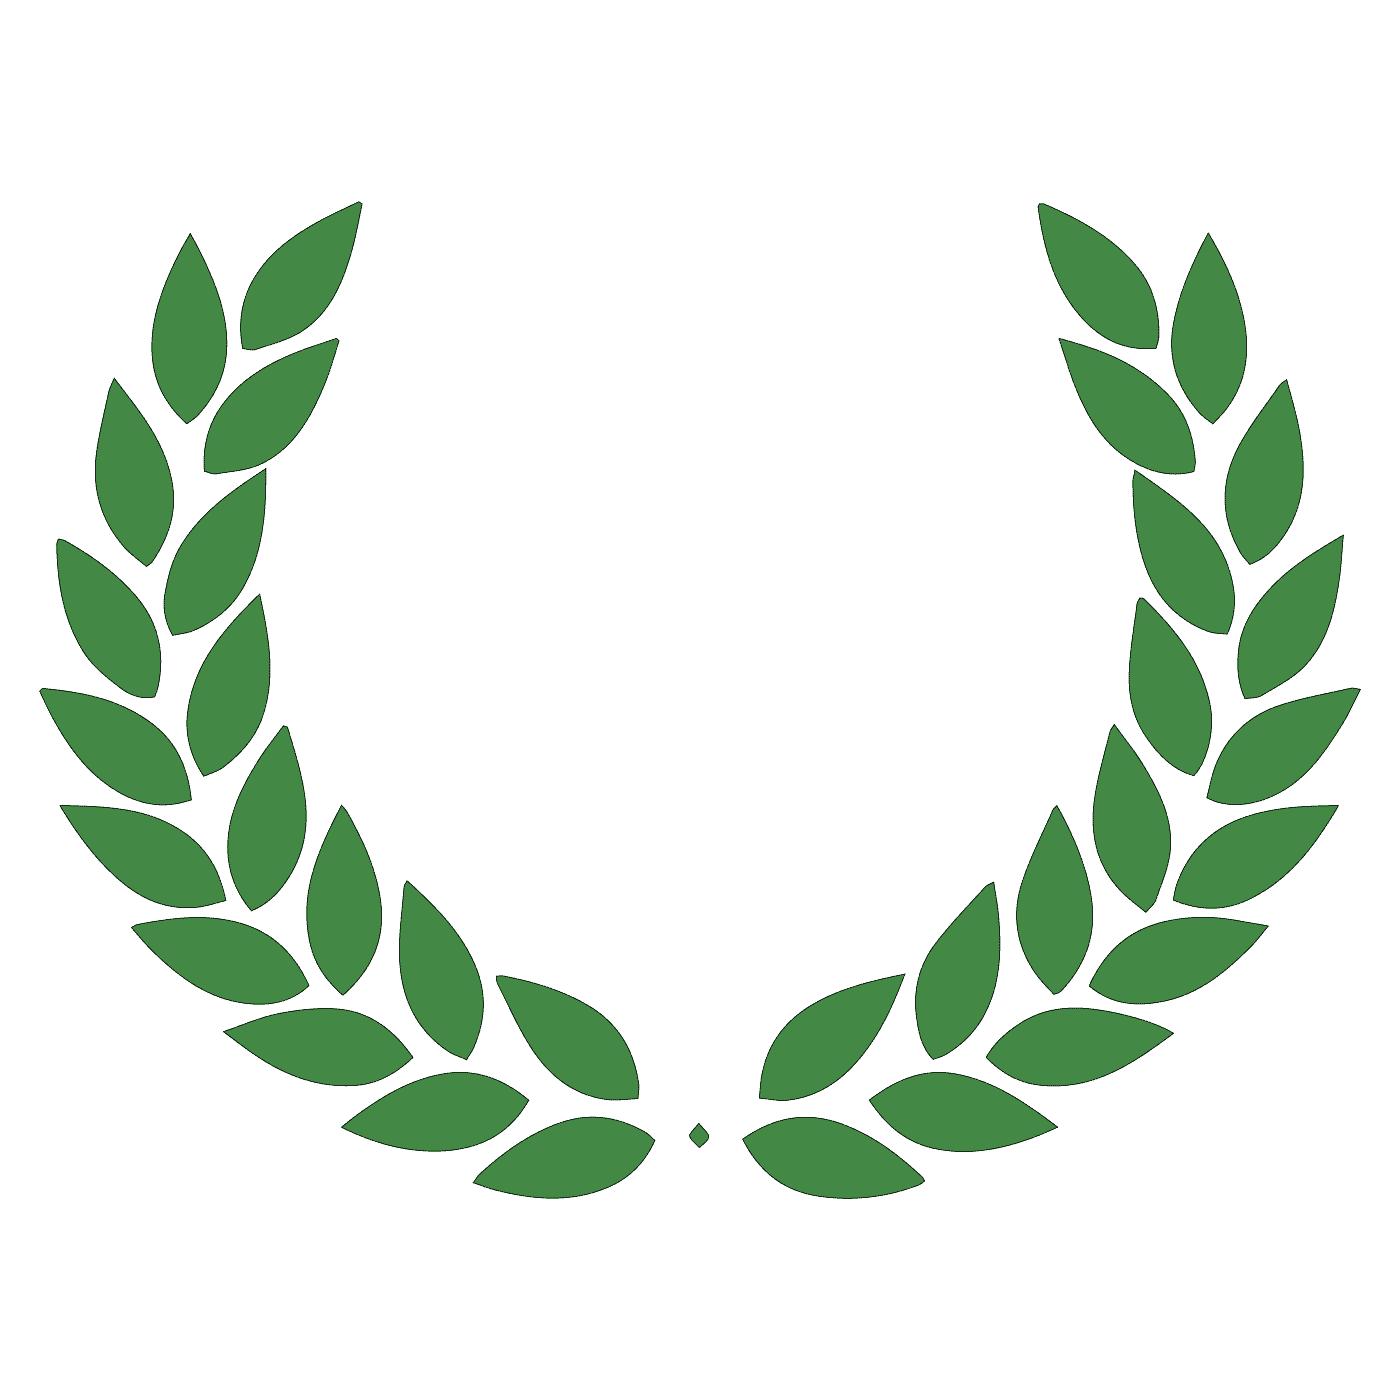 Laurel Wreath Meaning Symbolism and Origin Explained: Laurel Wreath Crowns Illustration